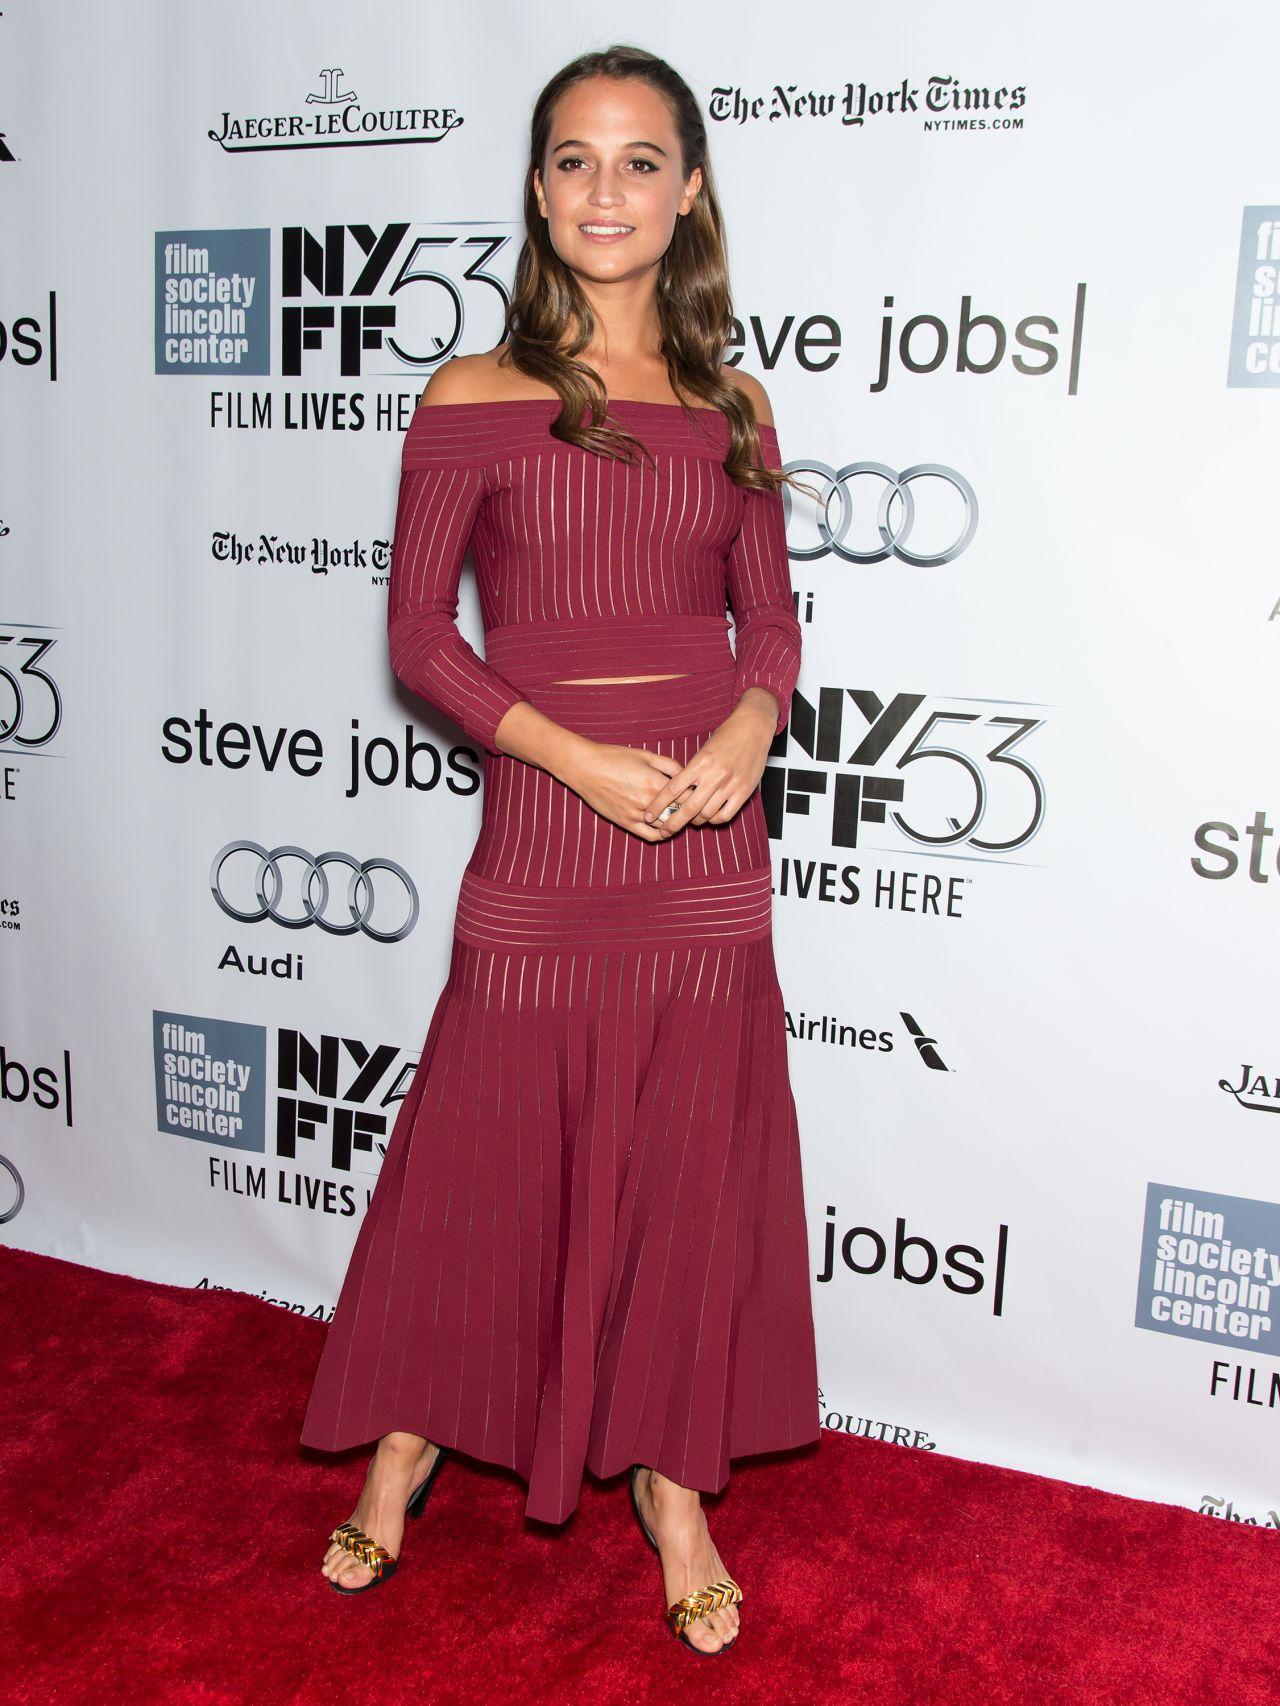 alicia-vikander-steve-jobs-premiere-at-nyff-in-new-york-city_1